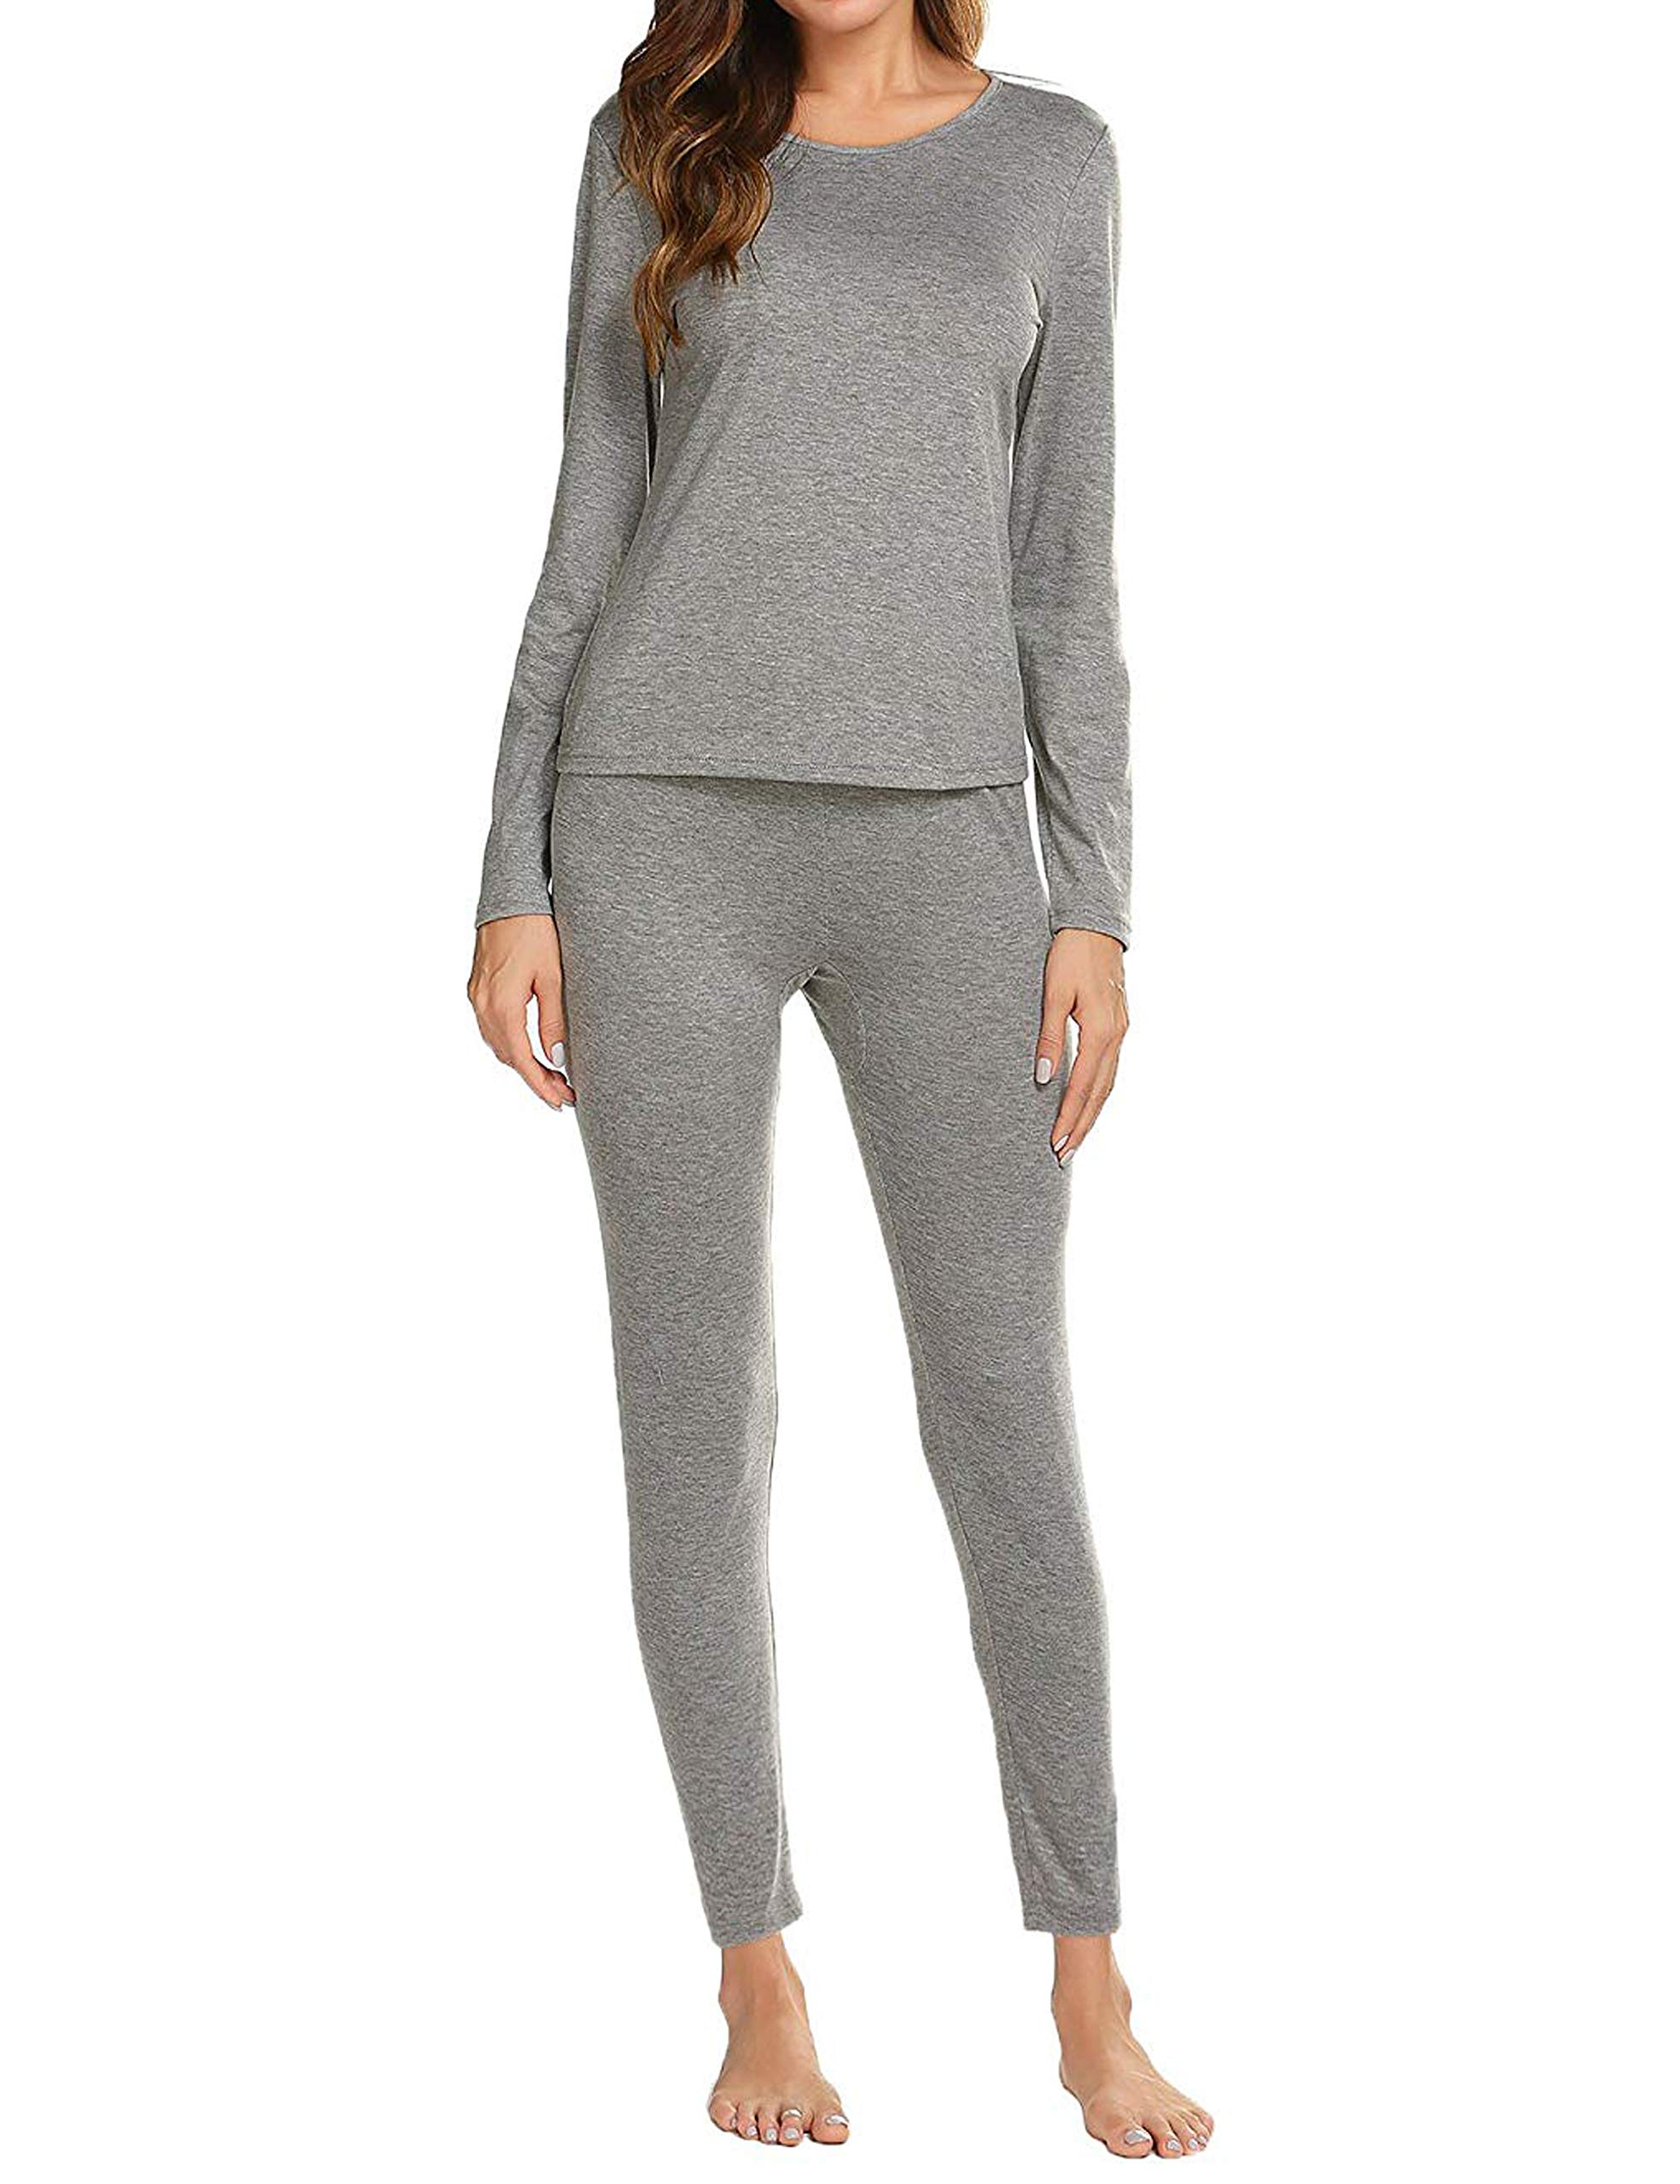 Aifer Thermal Underwear Long John Set Slimming Top & Bottom Pajama for Women